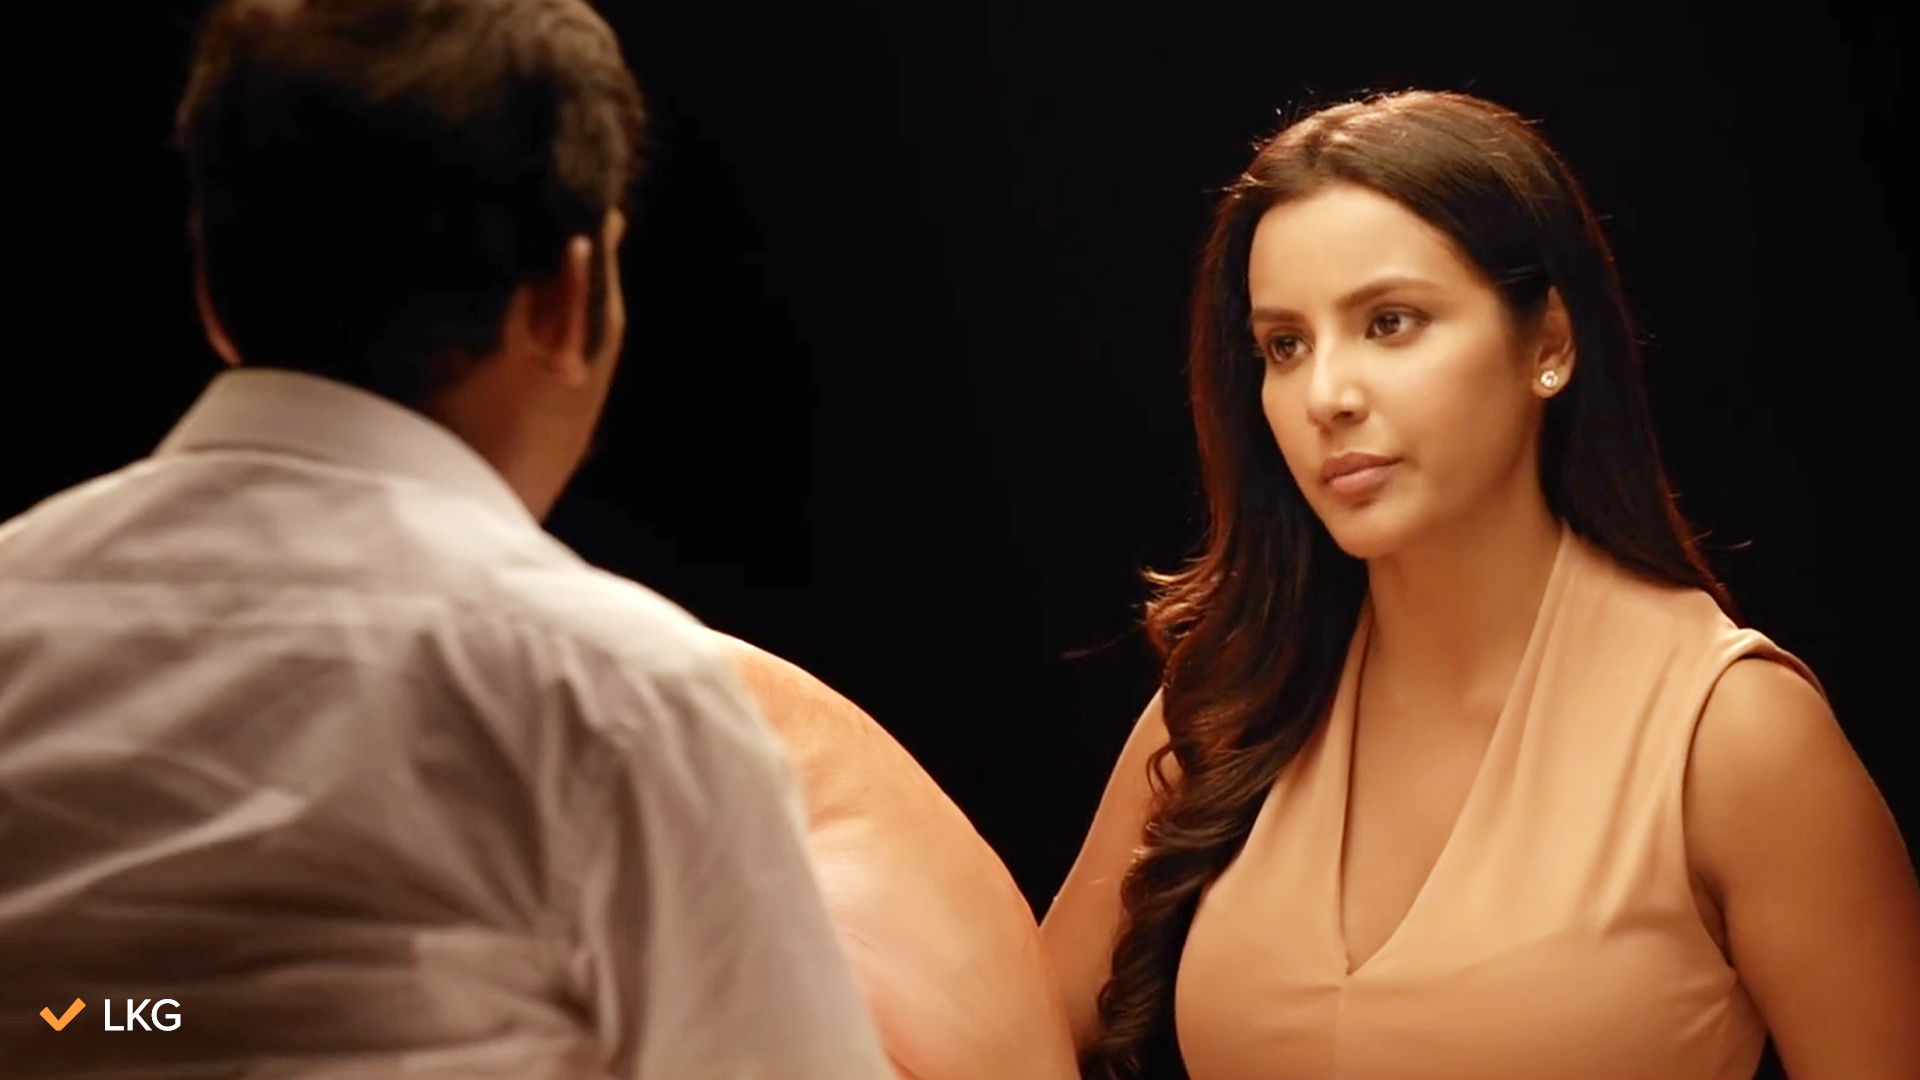 Actress Priya Anand LKG Telugu Dubbing movie on aha ott from June 25